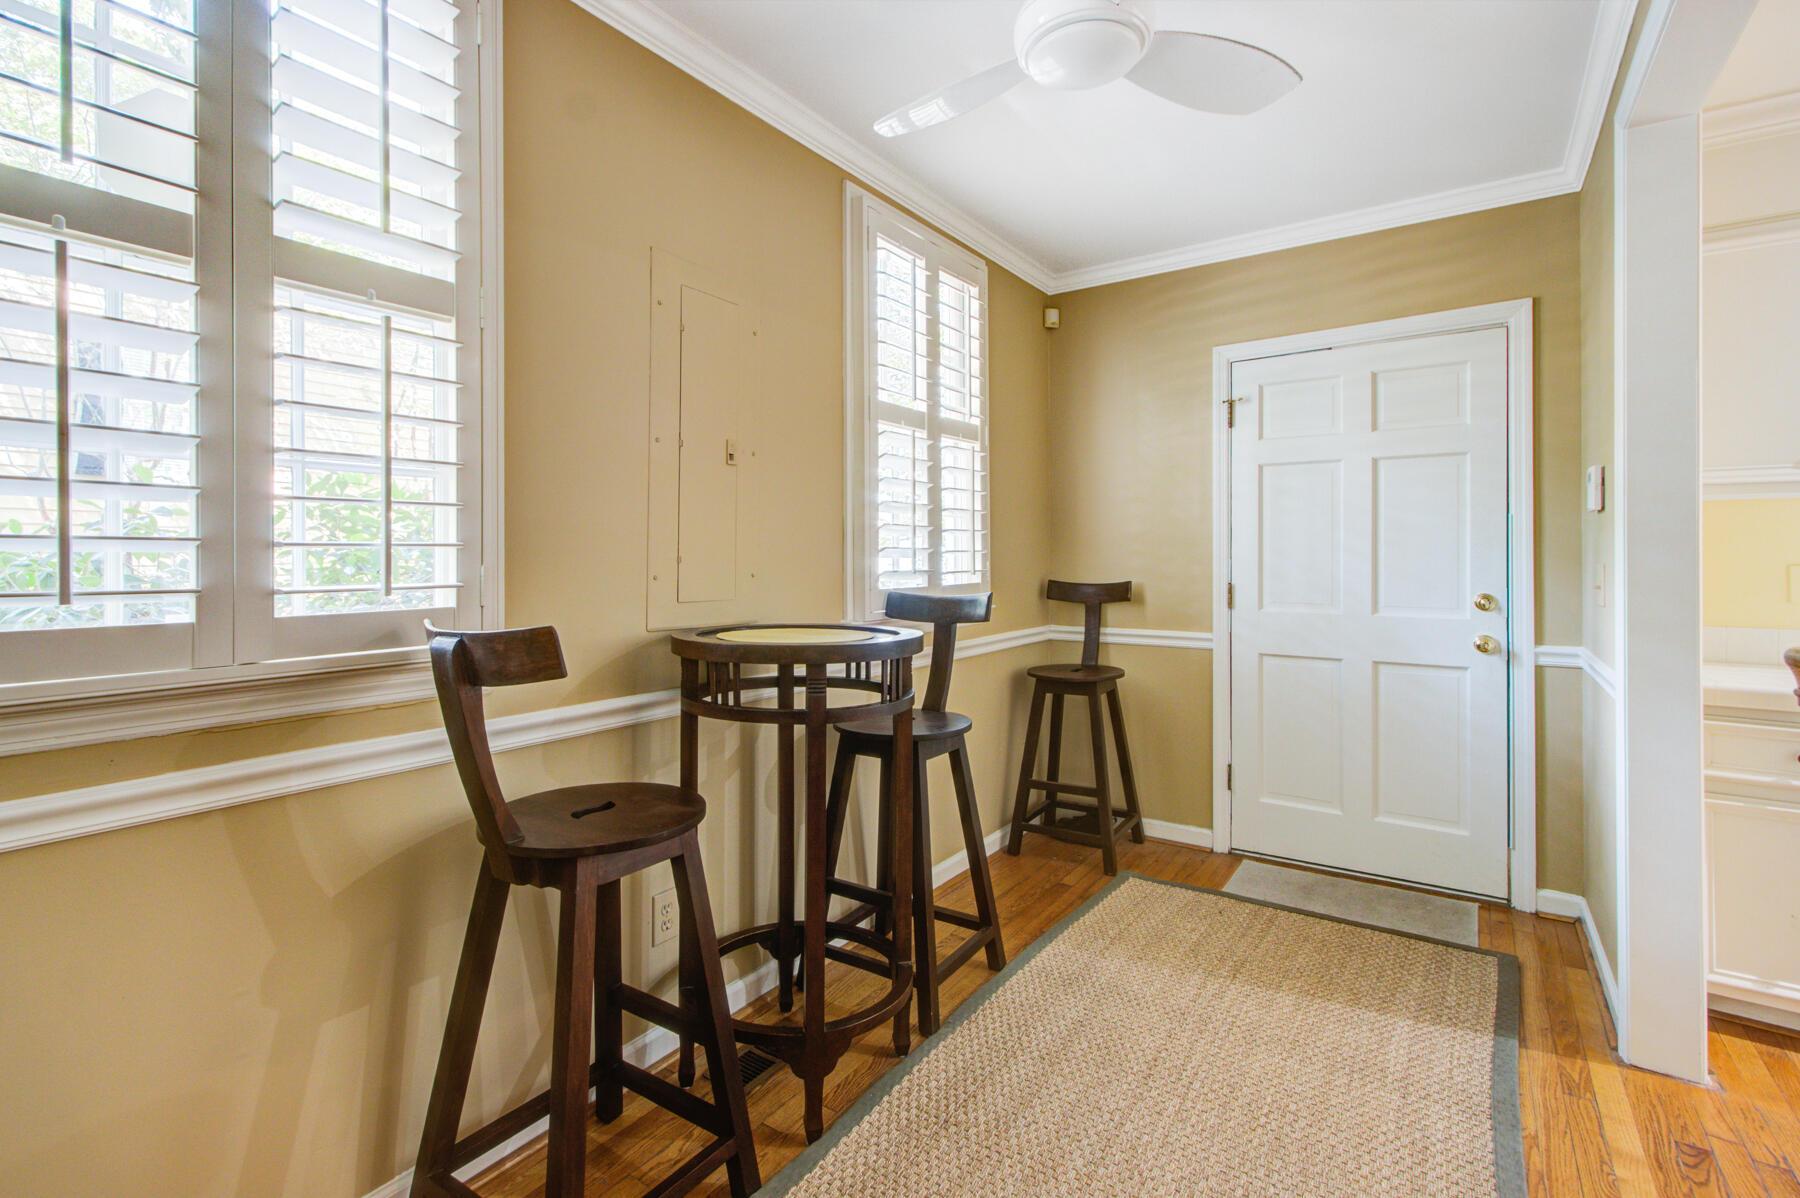 Radcliffeborough Homes For Sale - 48 Radcliffe, Charleston, SC - 10